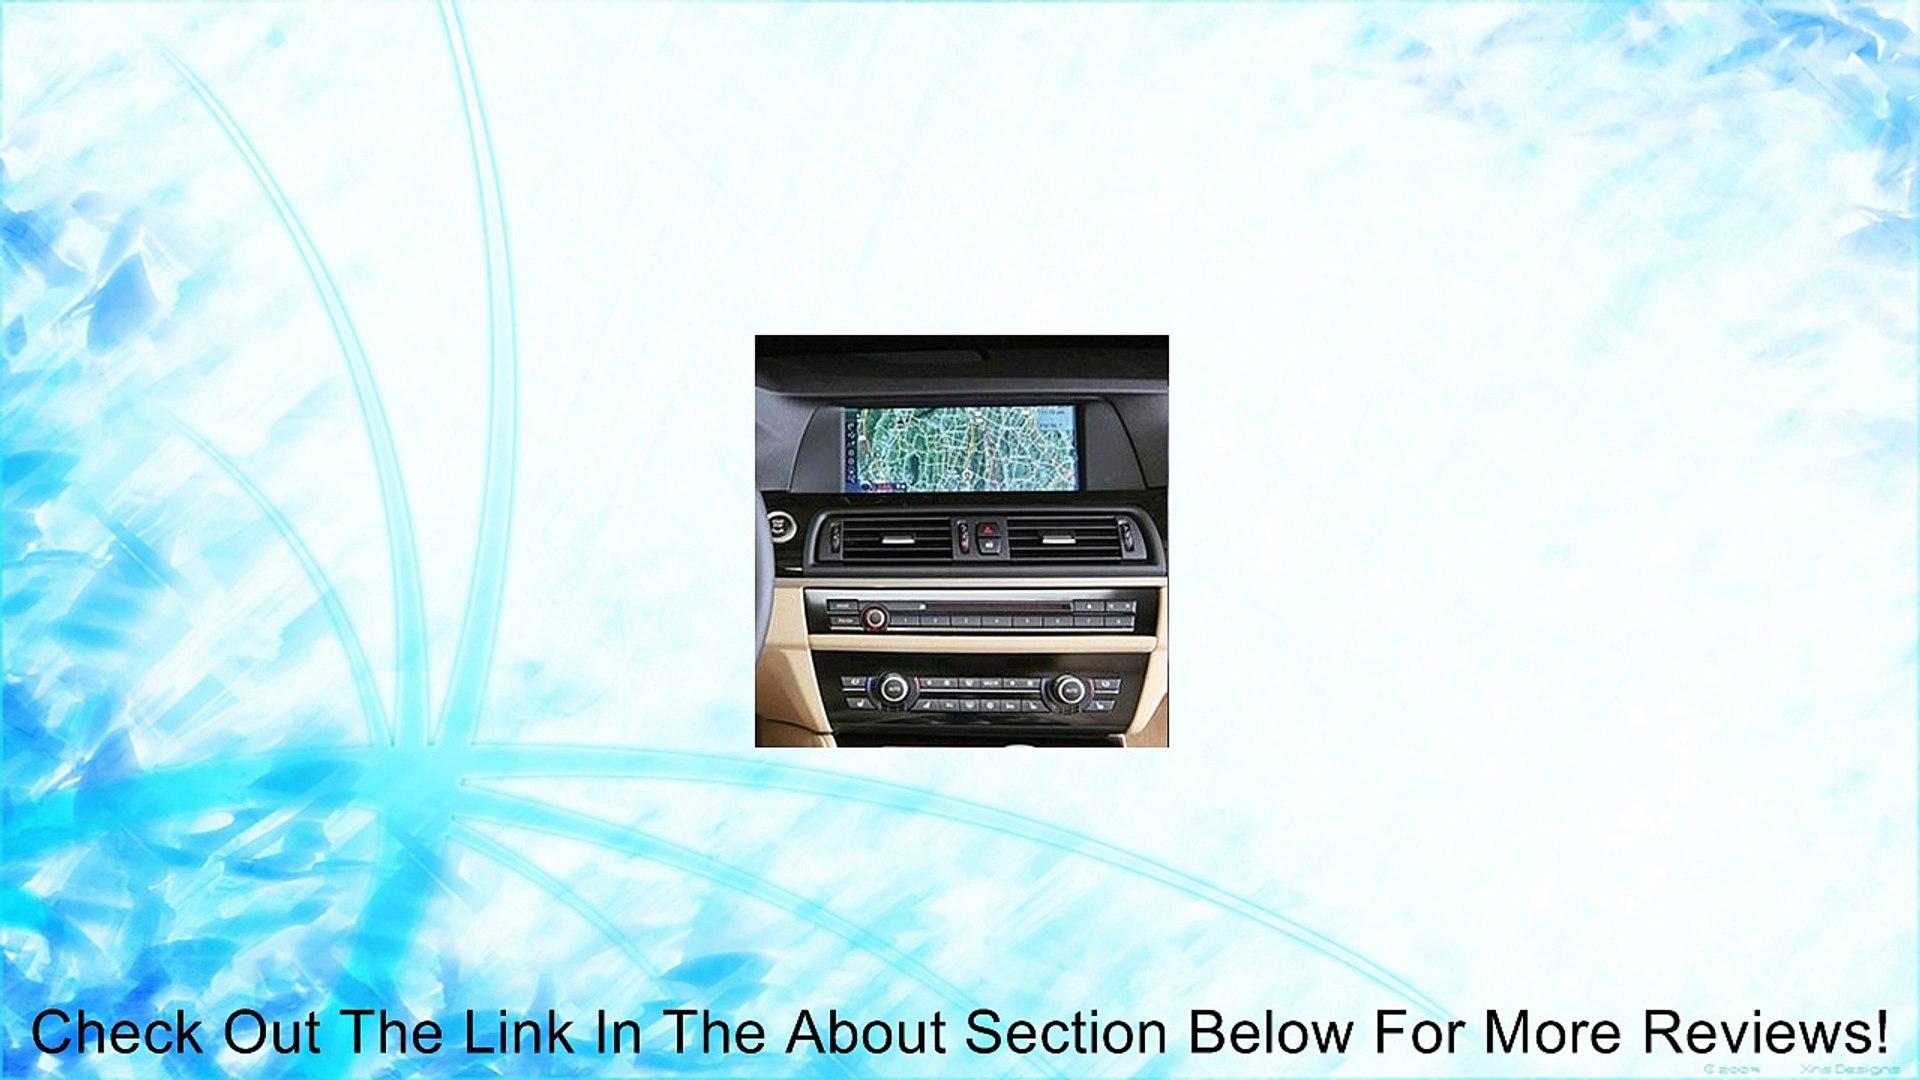 Genuine OEM BMW 2012 Navigation System Map Update DVD High Version (I-Bus DVD) - 3 Series 2005/ 3 Series Convertible 2006/ 3 Series Coupe 2006/ M3 Convertible 2005-2006/ M3 Coupe 2005-2006/ 7 Series 2005-2008/ X3 SAV 2005-2010/ X5 2005-2006/ Z4 Models 200